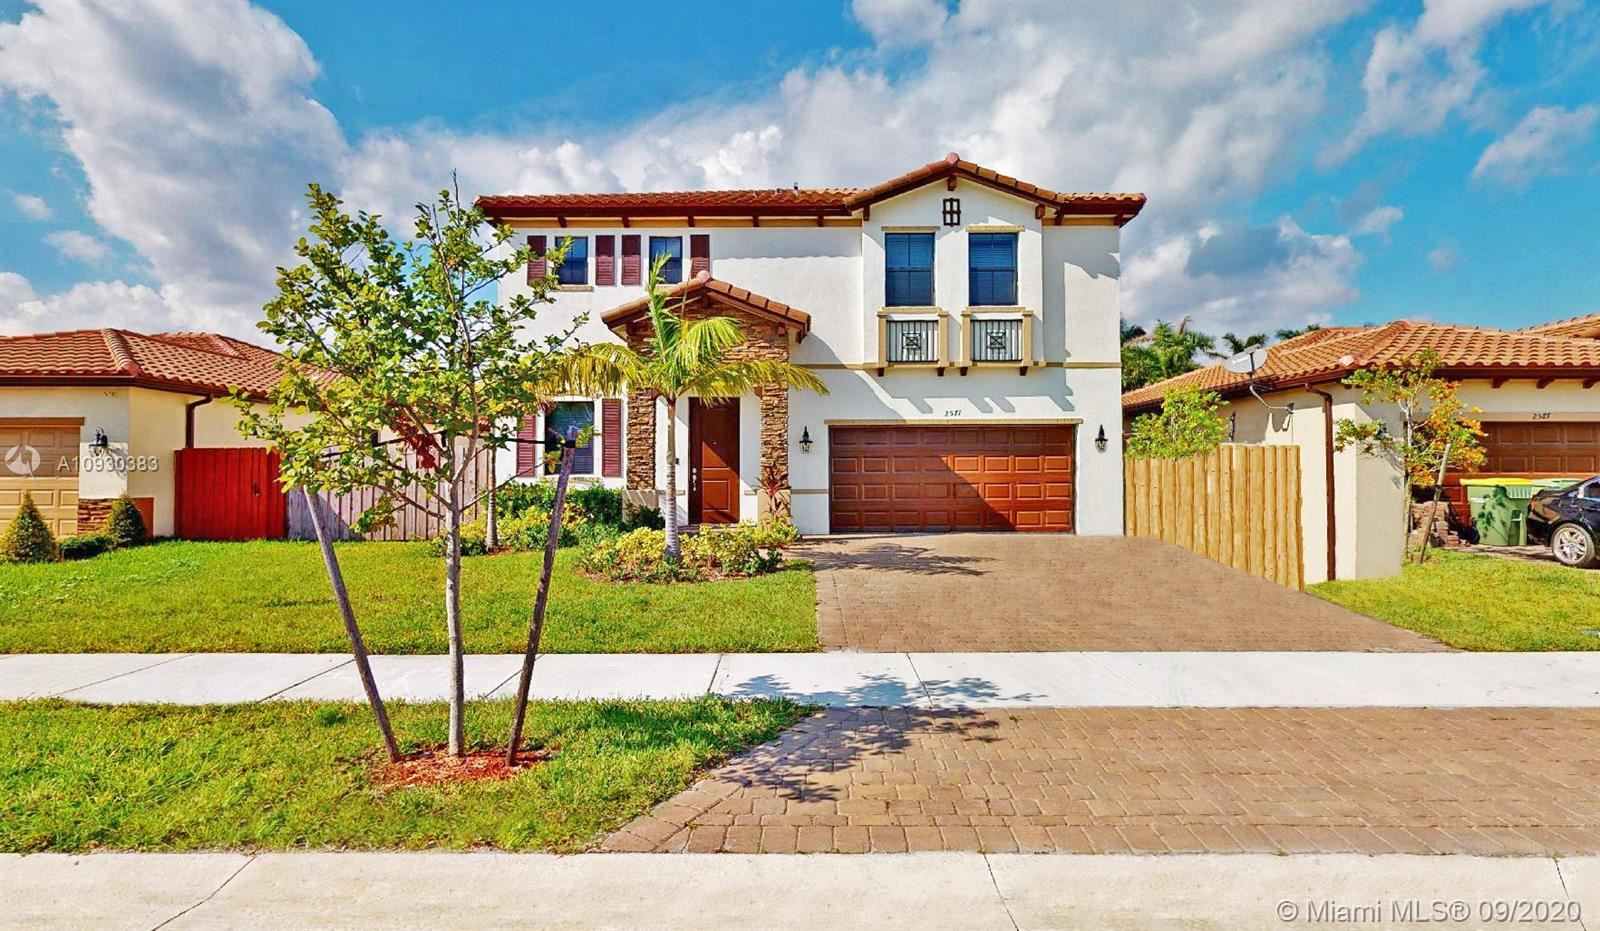 2571 SE 1st St, Homestead, FL 33033 - #: A10930383